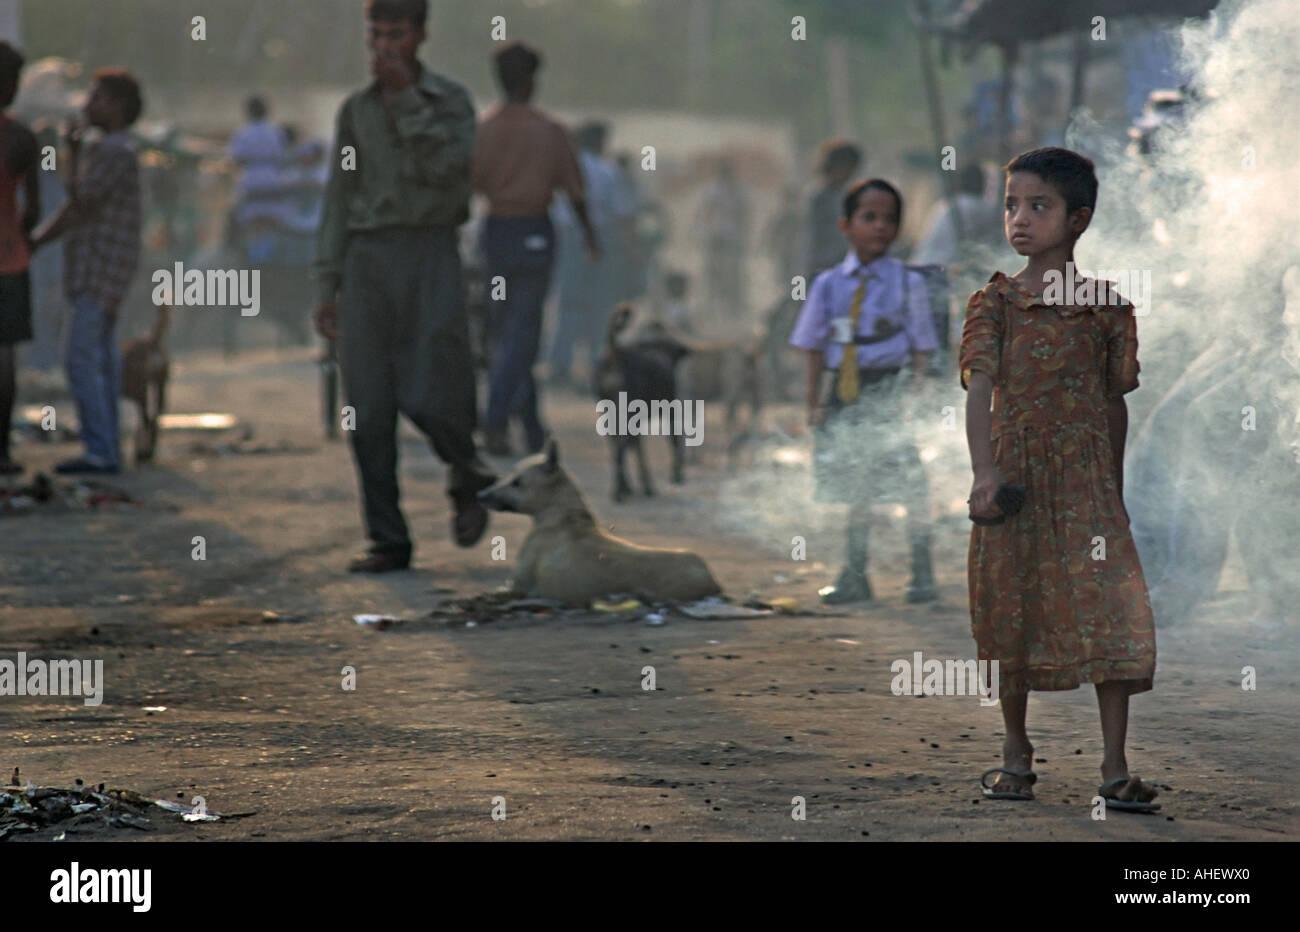 Atmospheric morning urban street scene Agra India - Stock Image